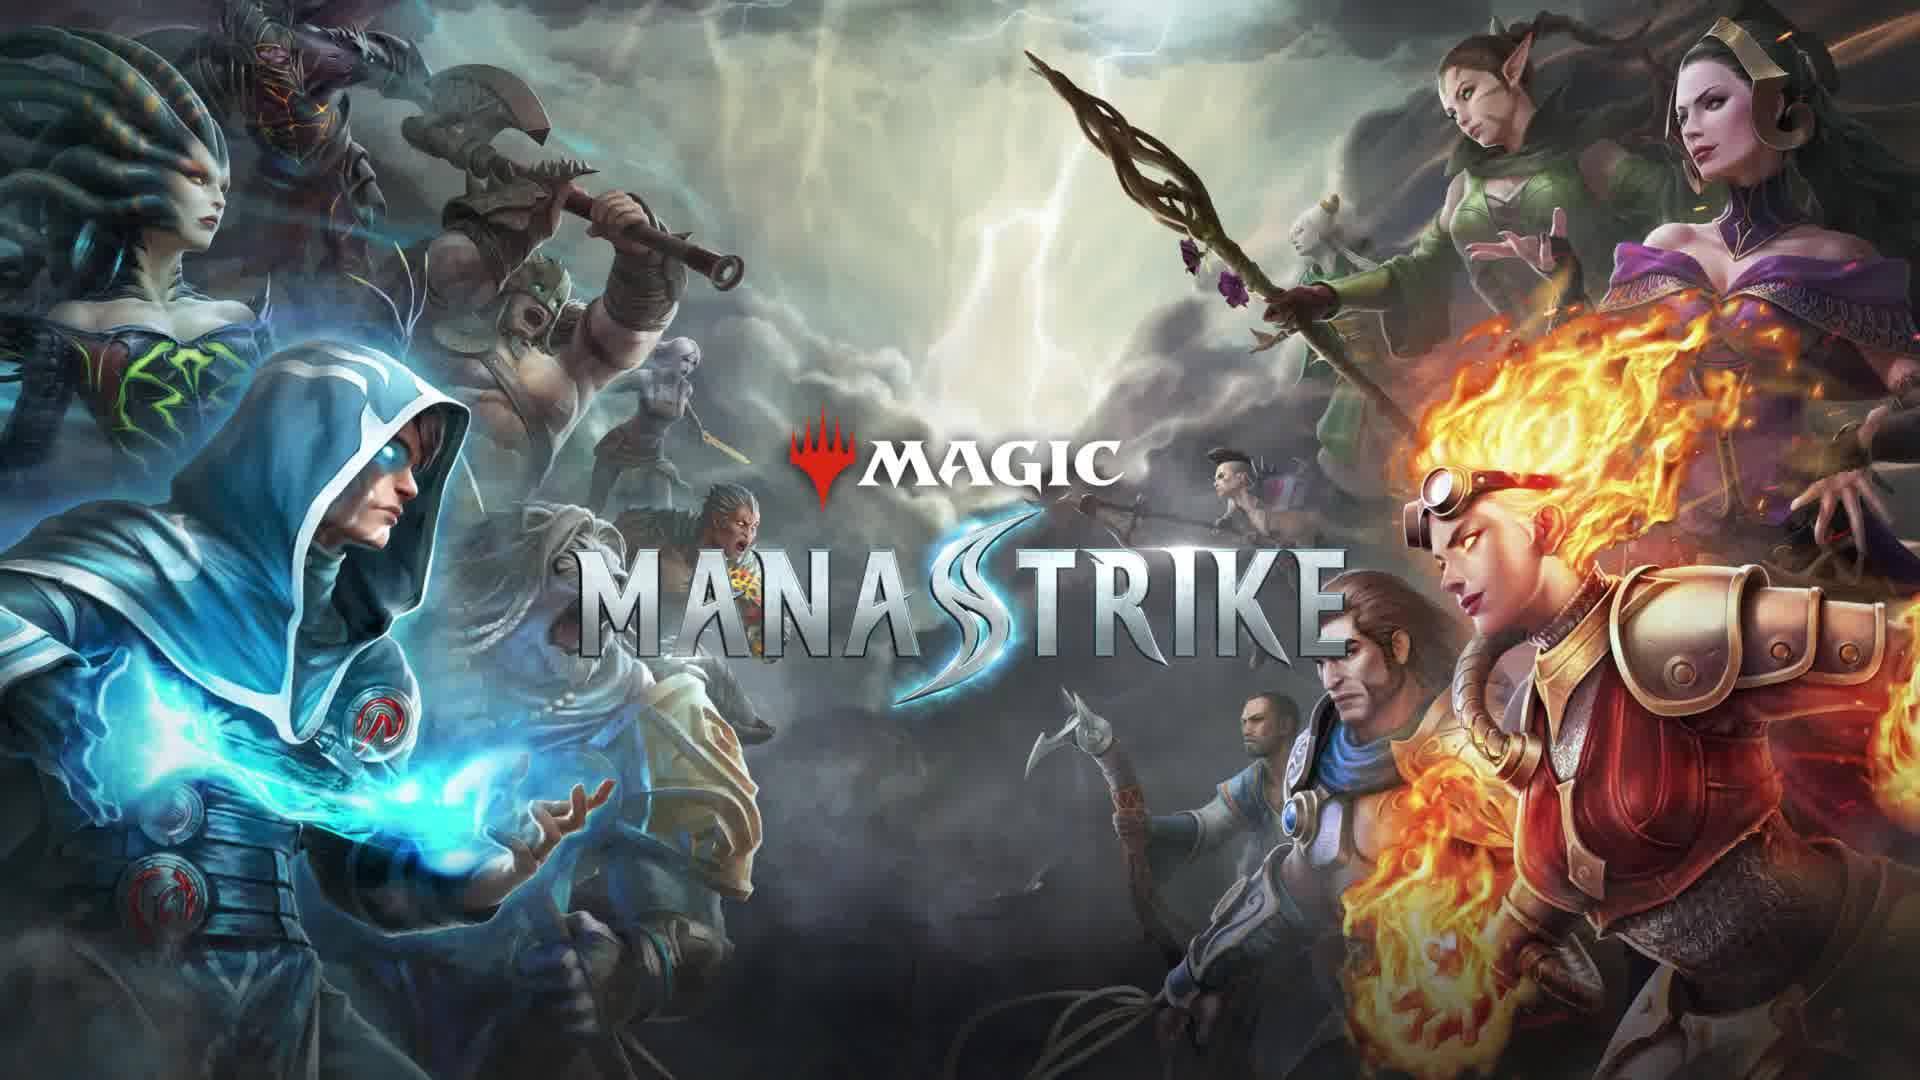 MAGIC MANASTRIKE 1182020 2